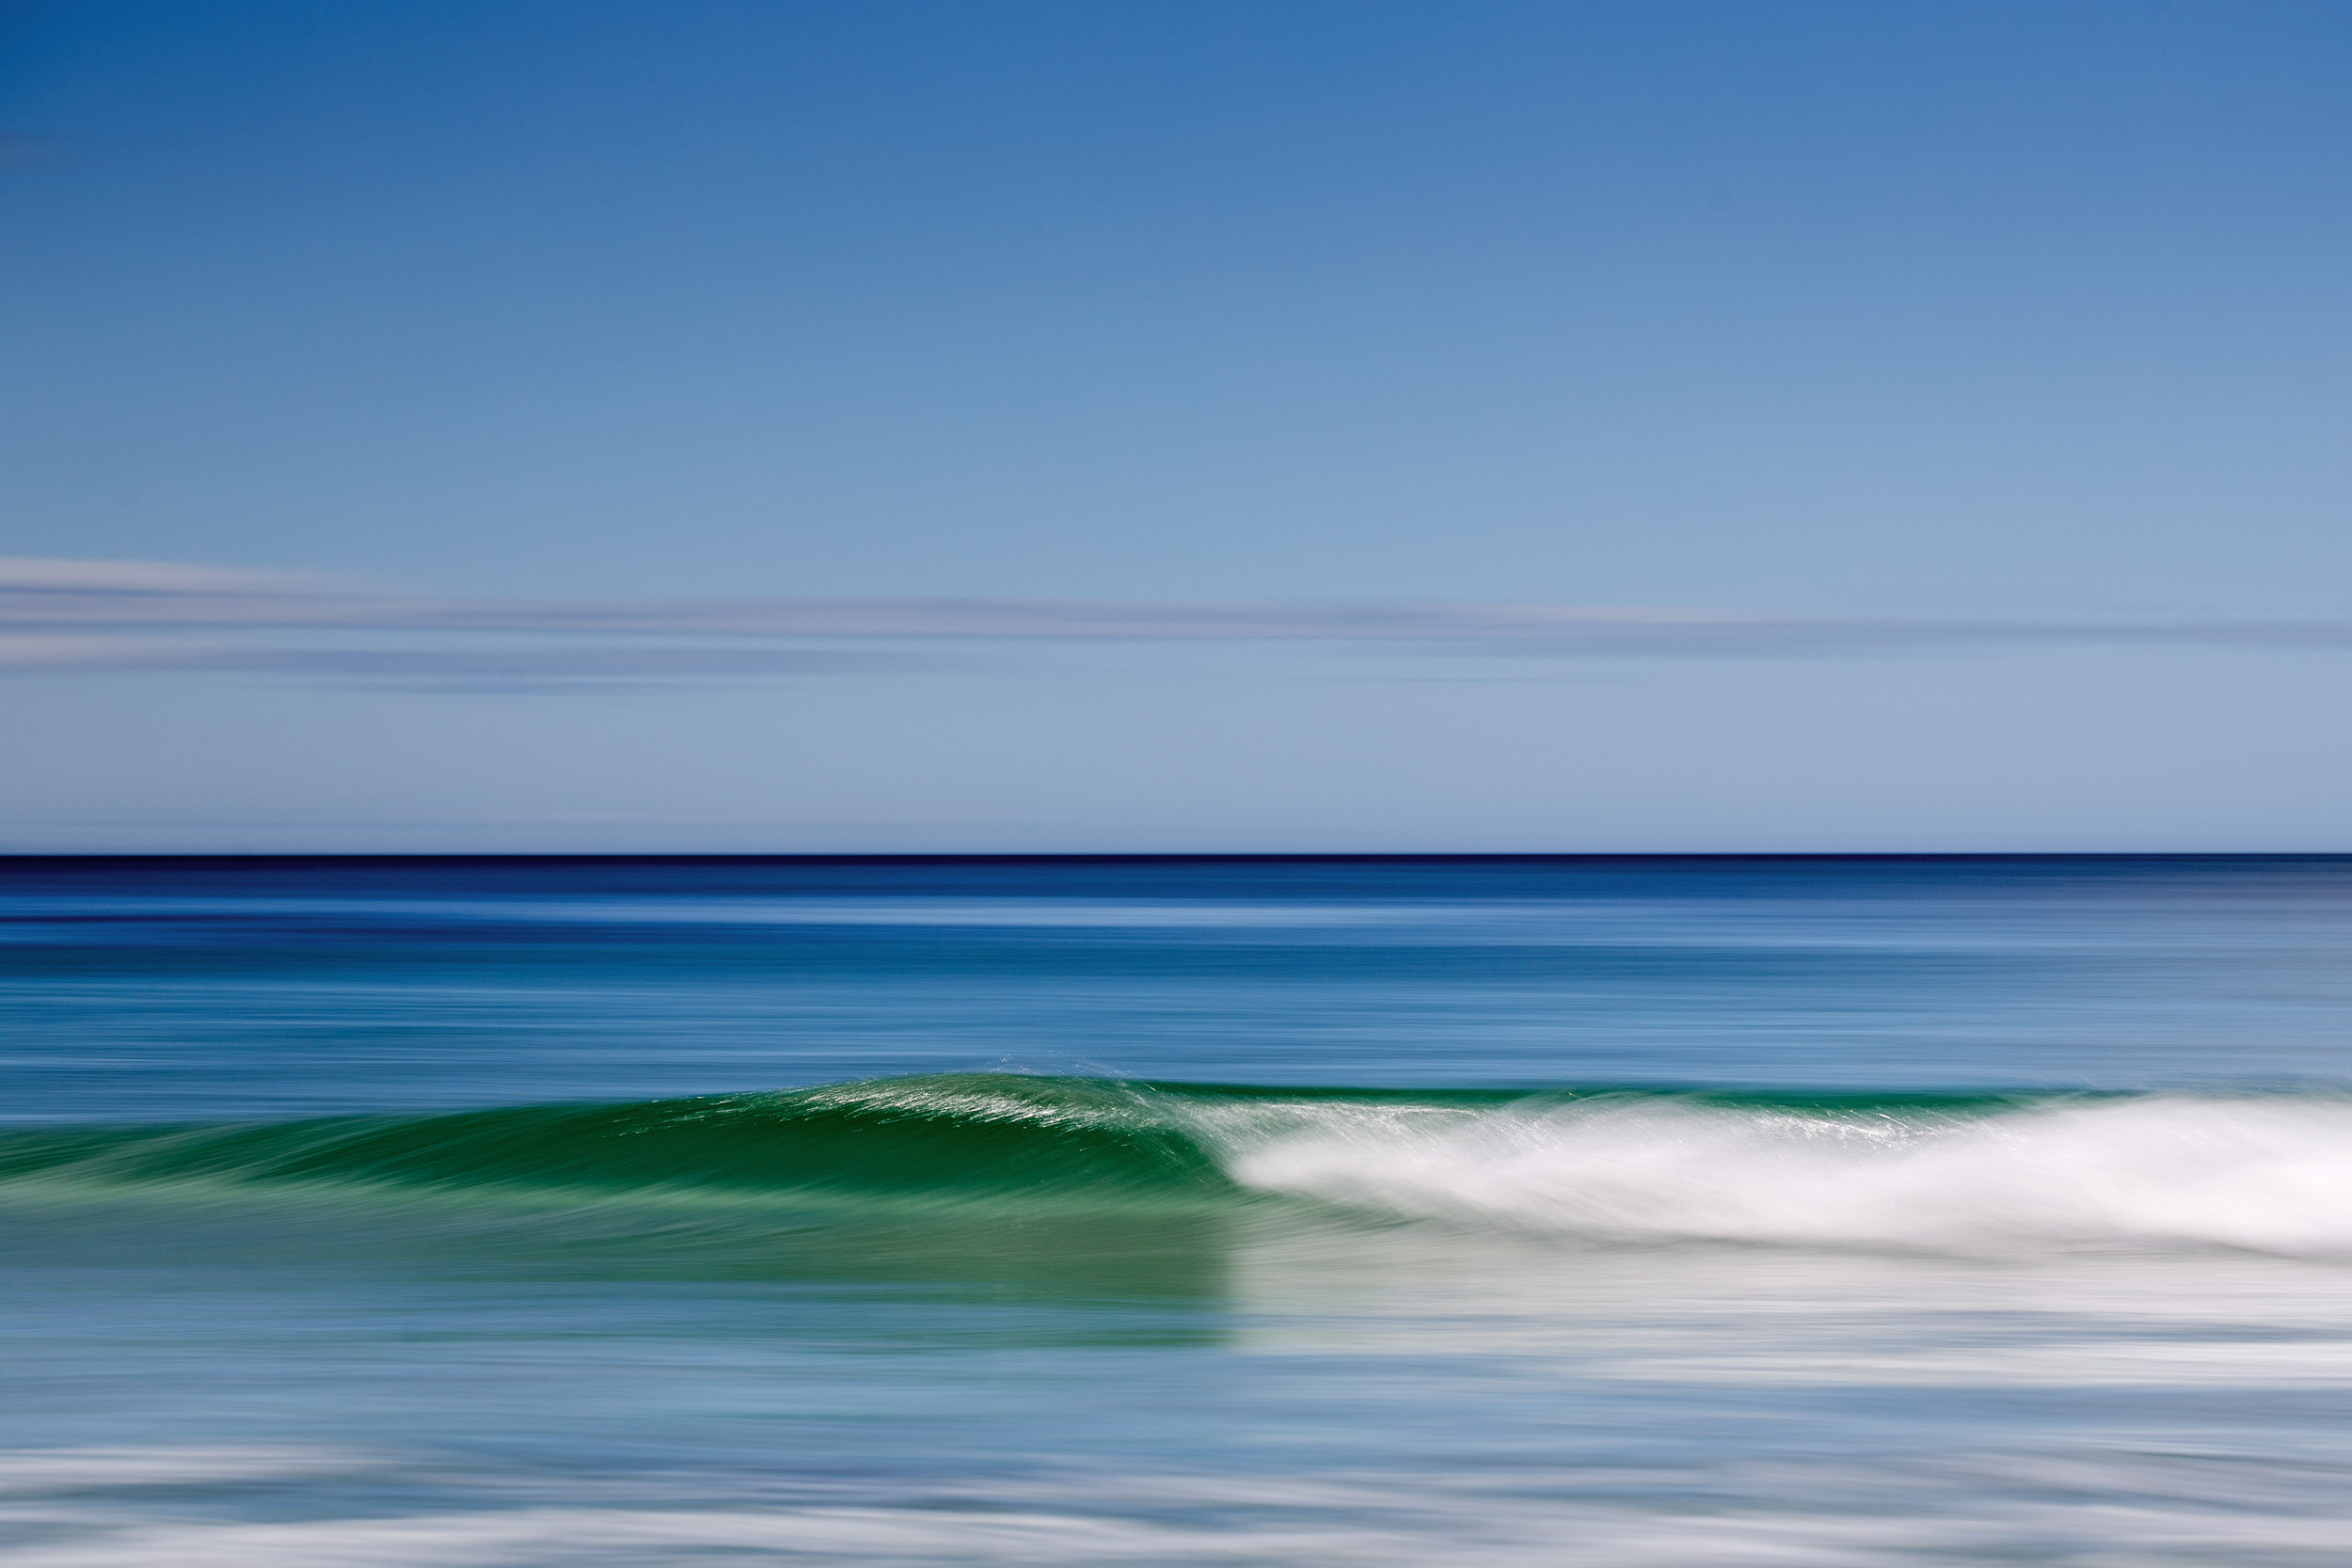 bruny-island-speed-blur-waves.jpg